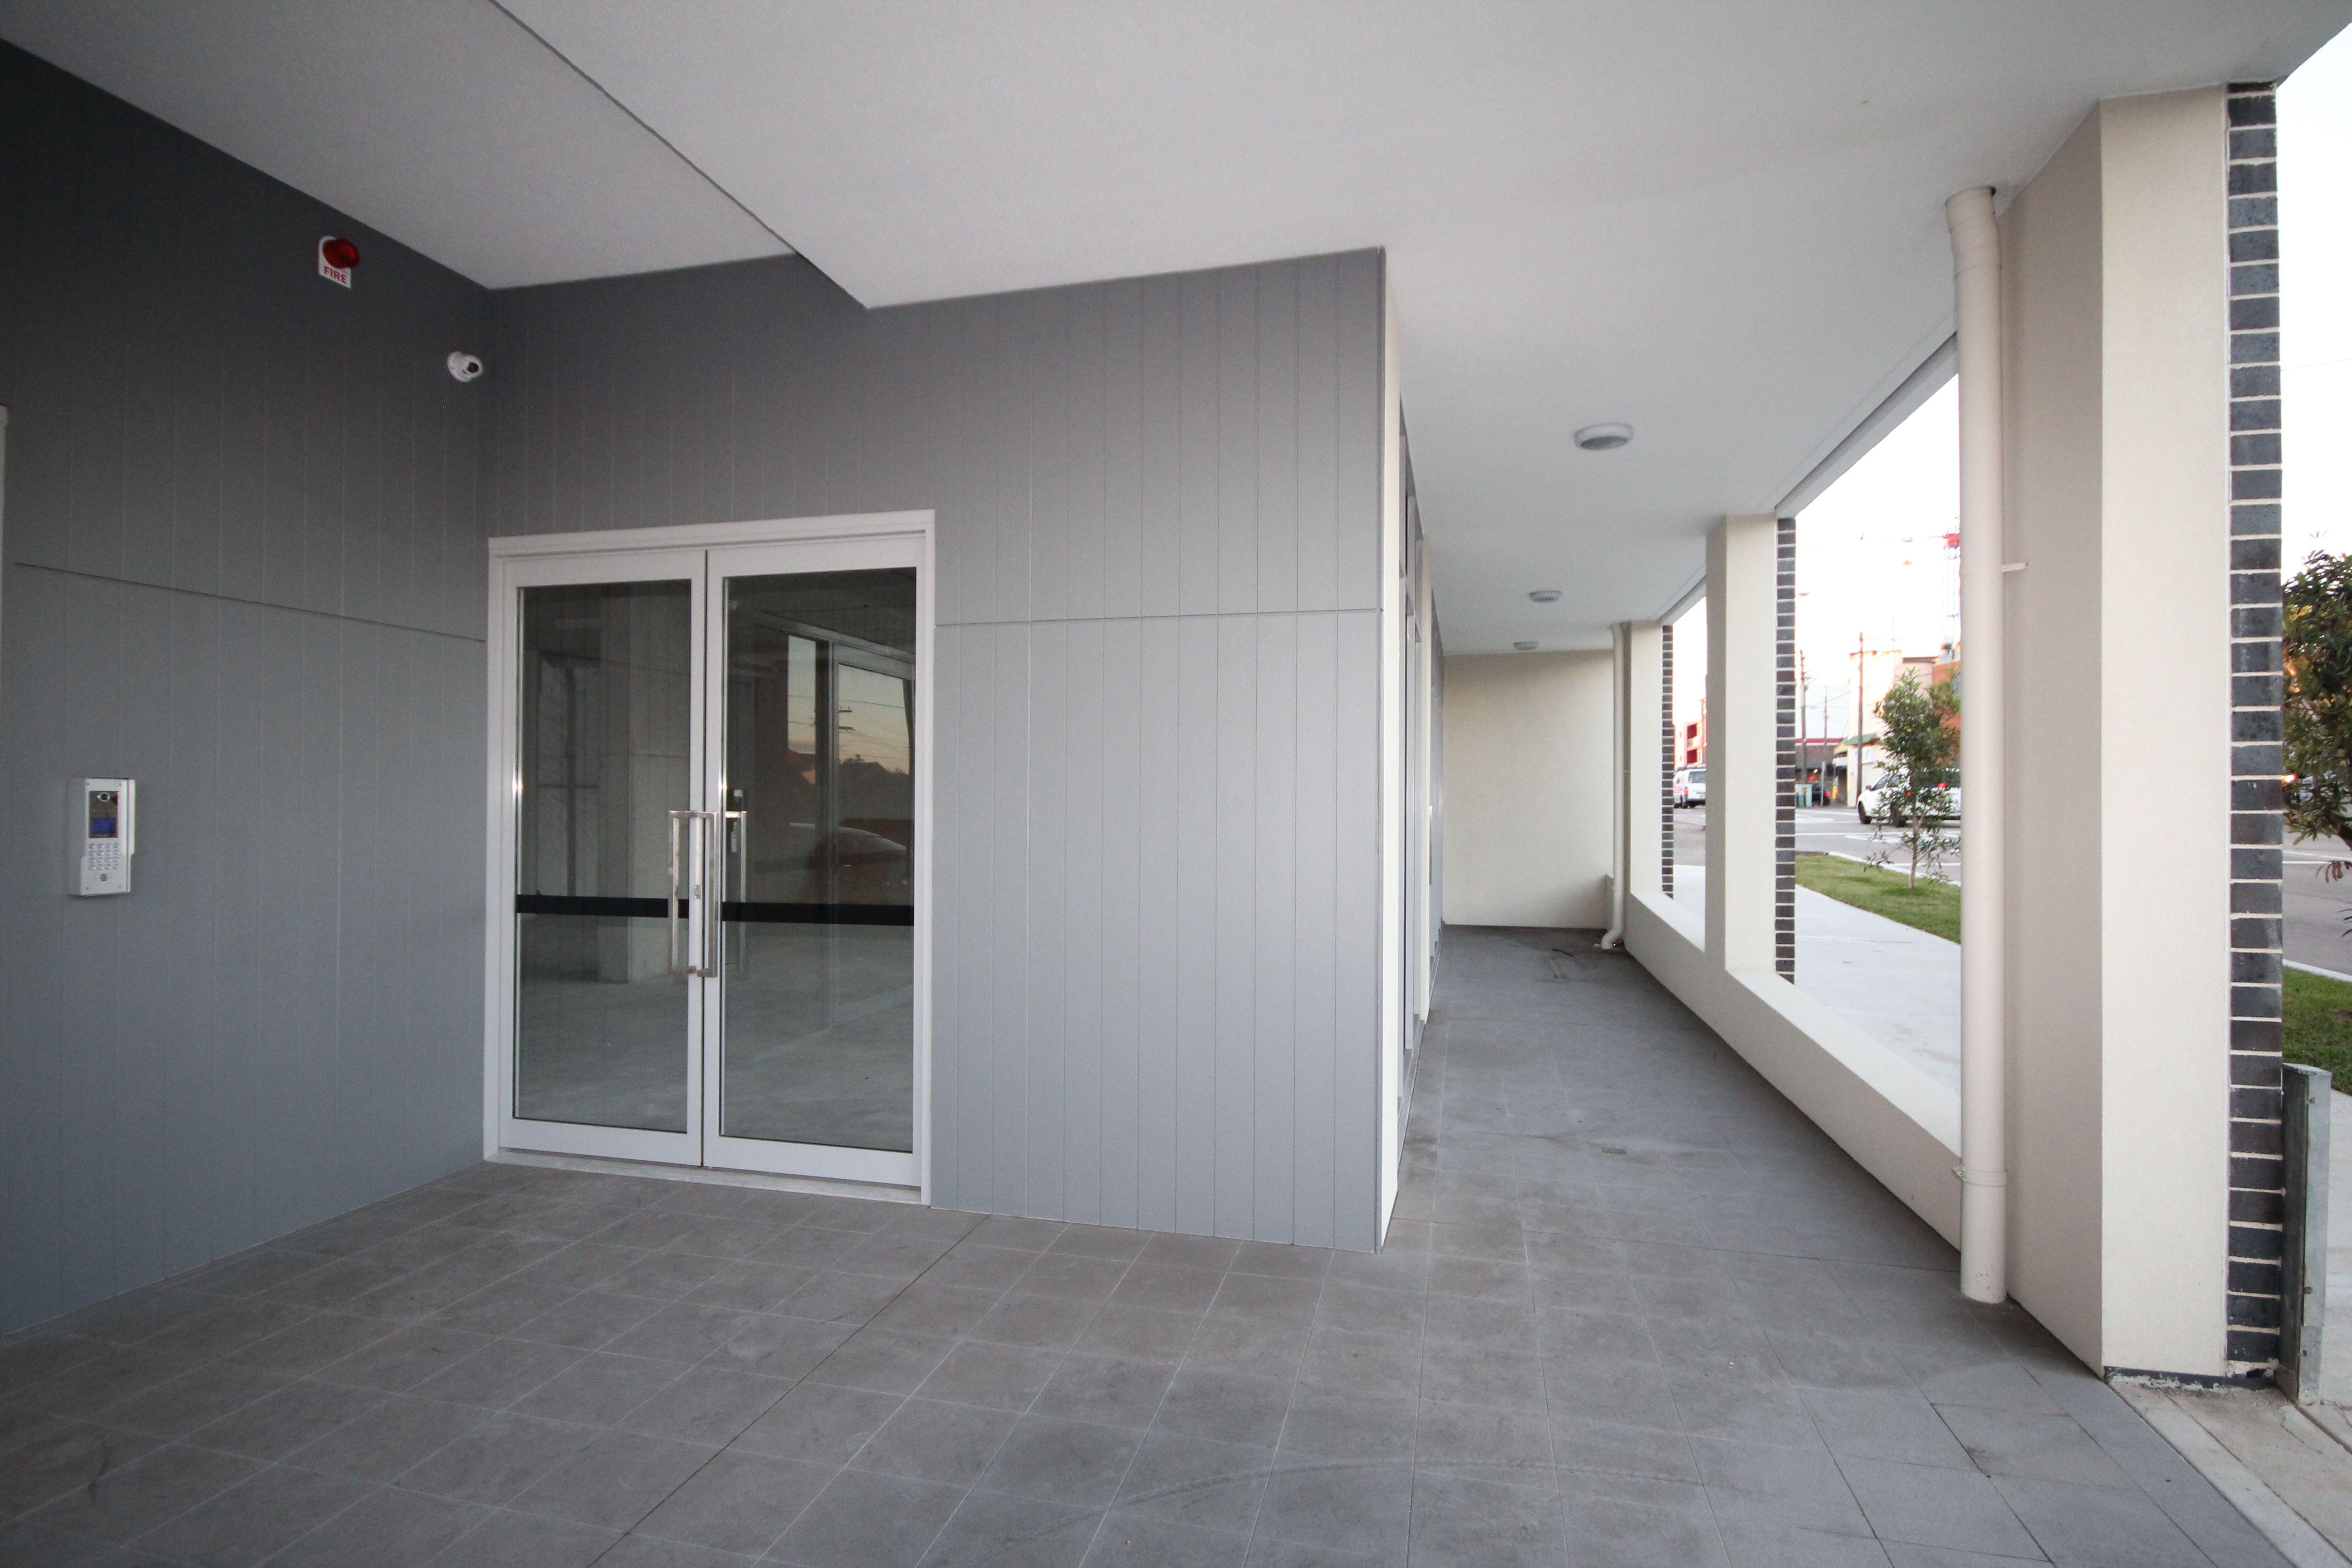 Shop 1/247-249 Homebush Road, Strathfield South NSW 2136